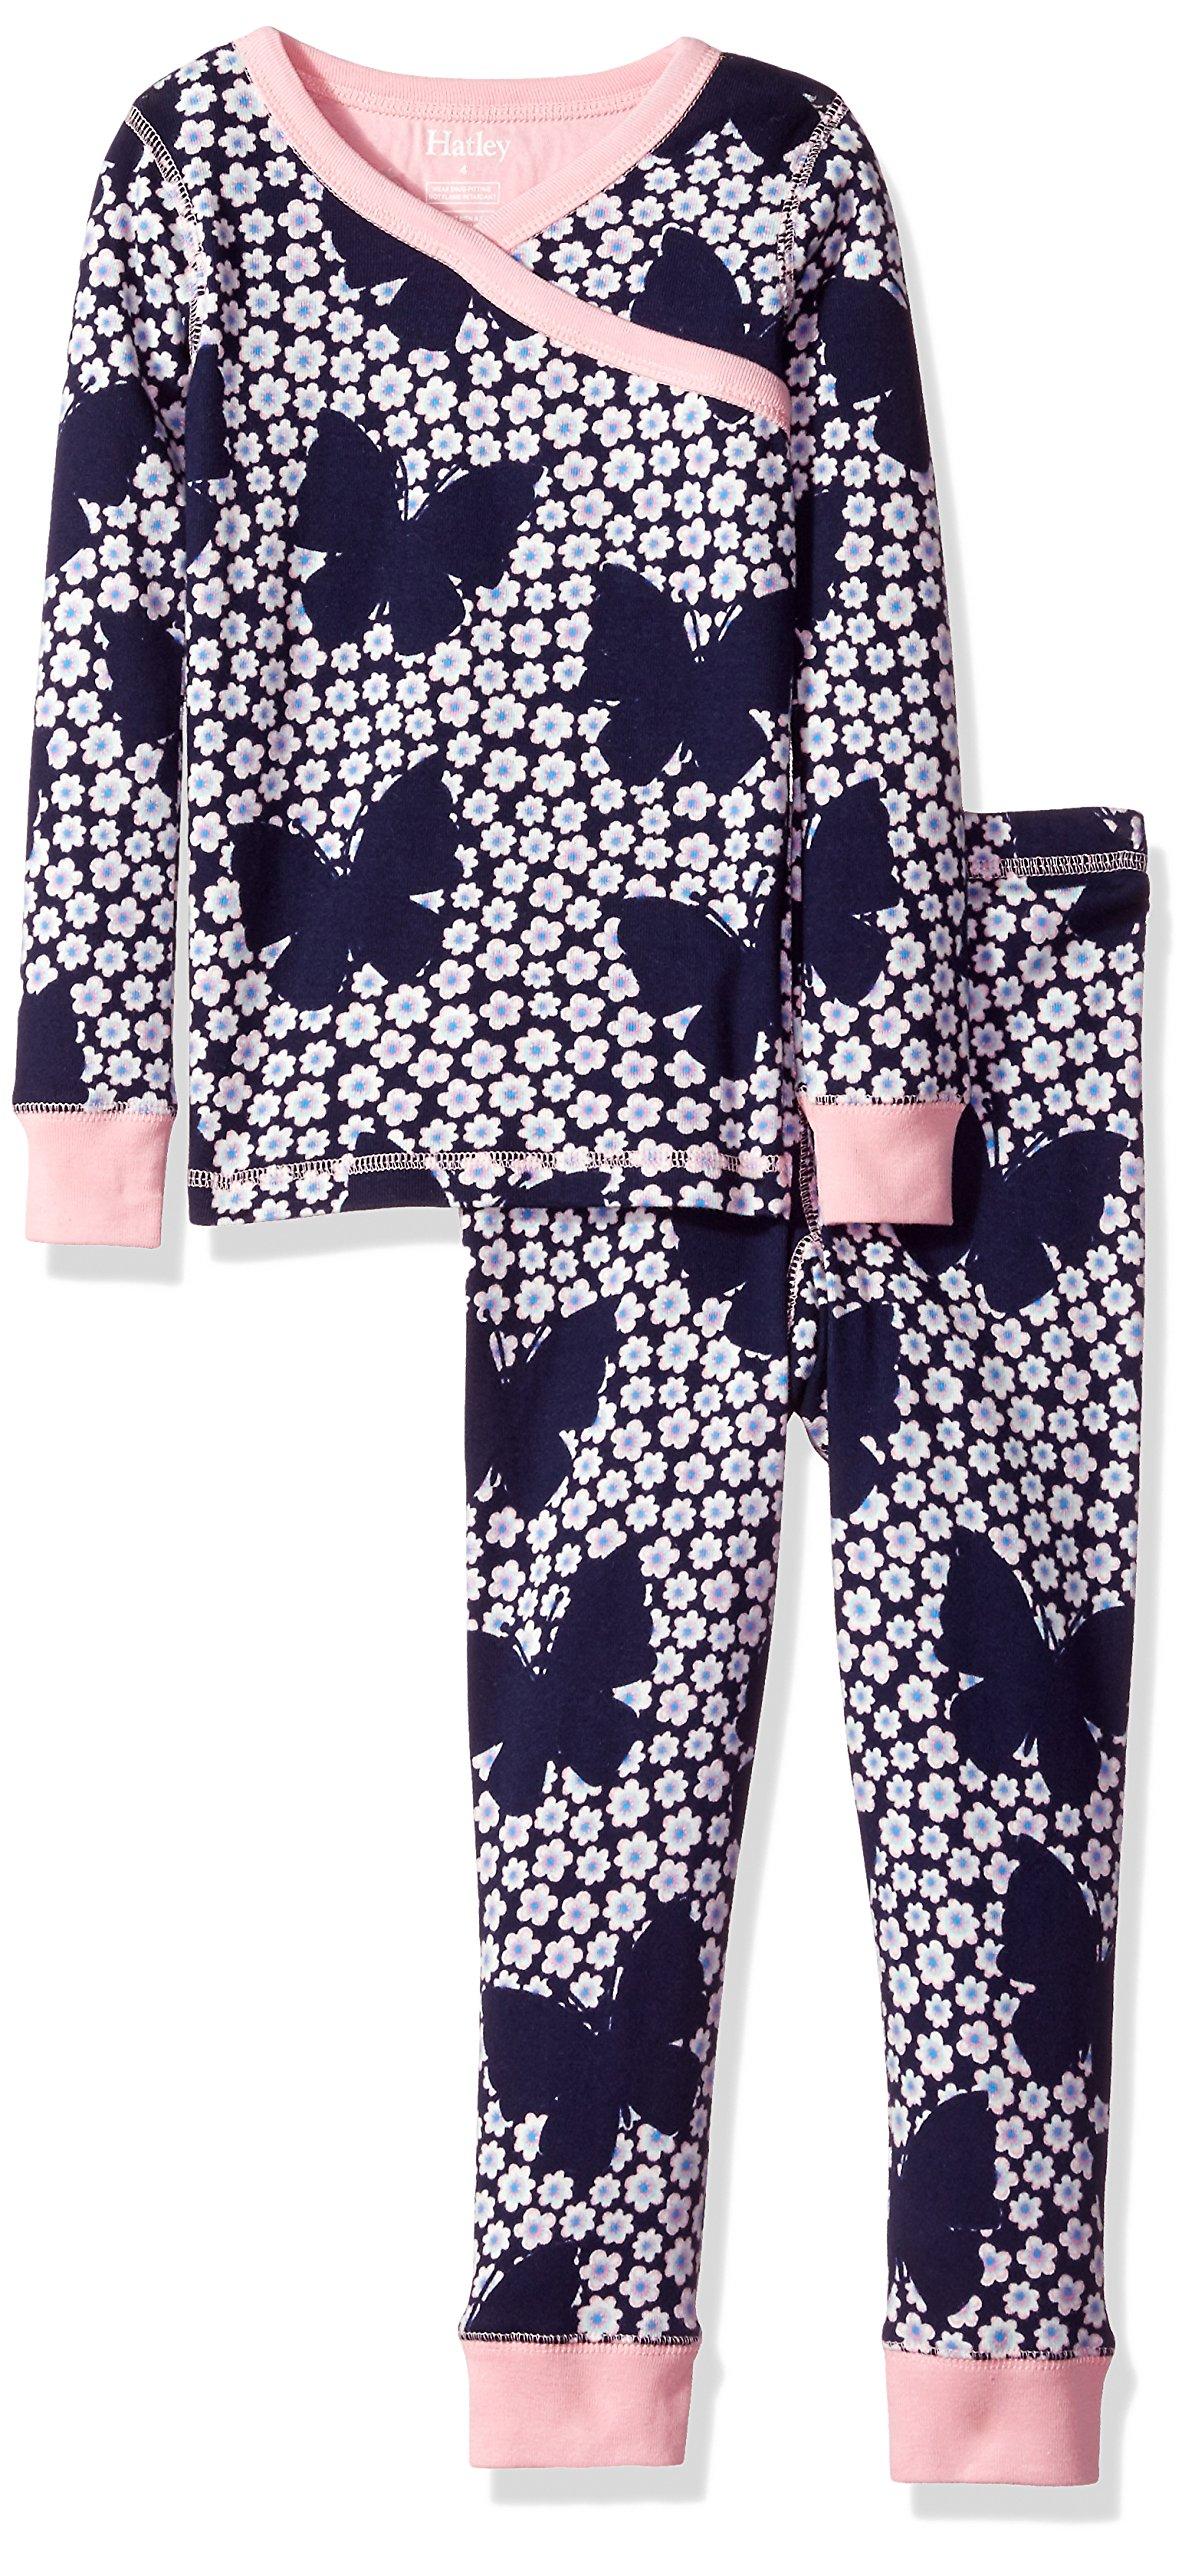 Hatley Big Girls' Organic Cotton Long Sleeve Printed Pajama Sets, Butterflies and Buds, 7 Years